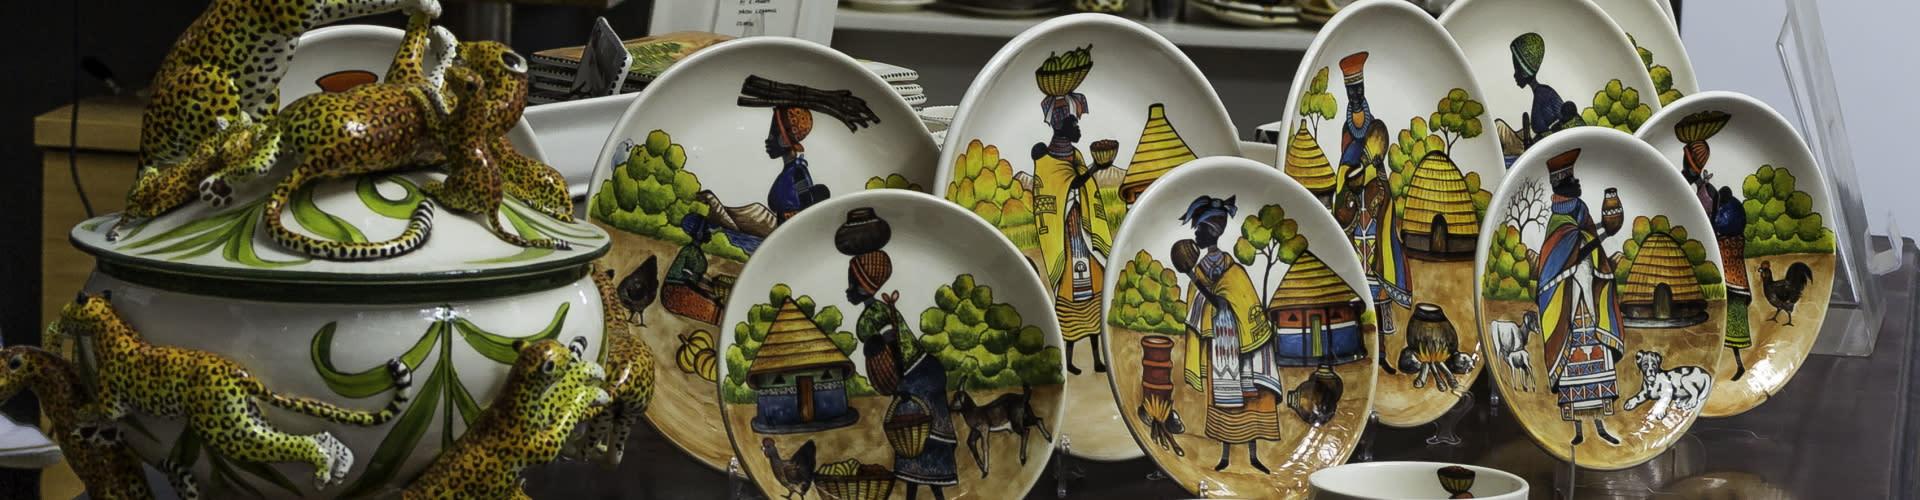 Nkosi Ceramics